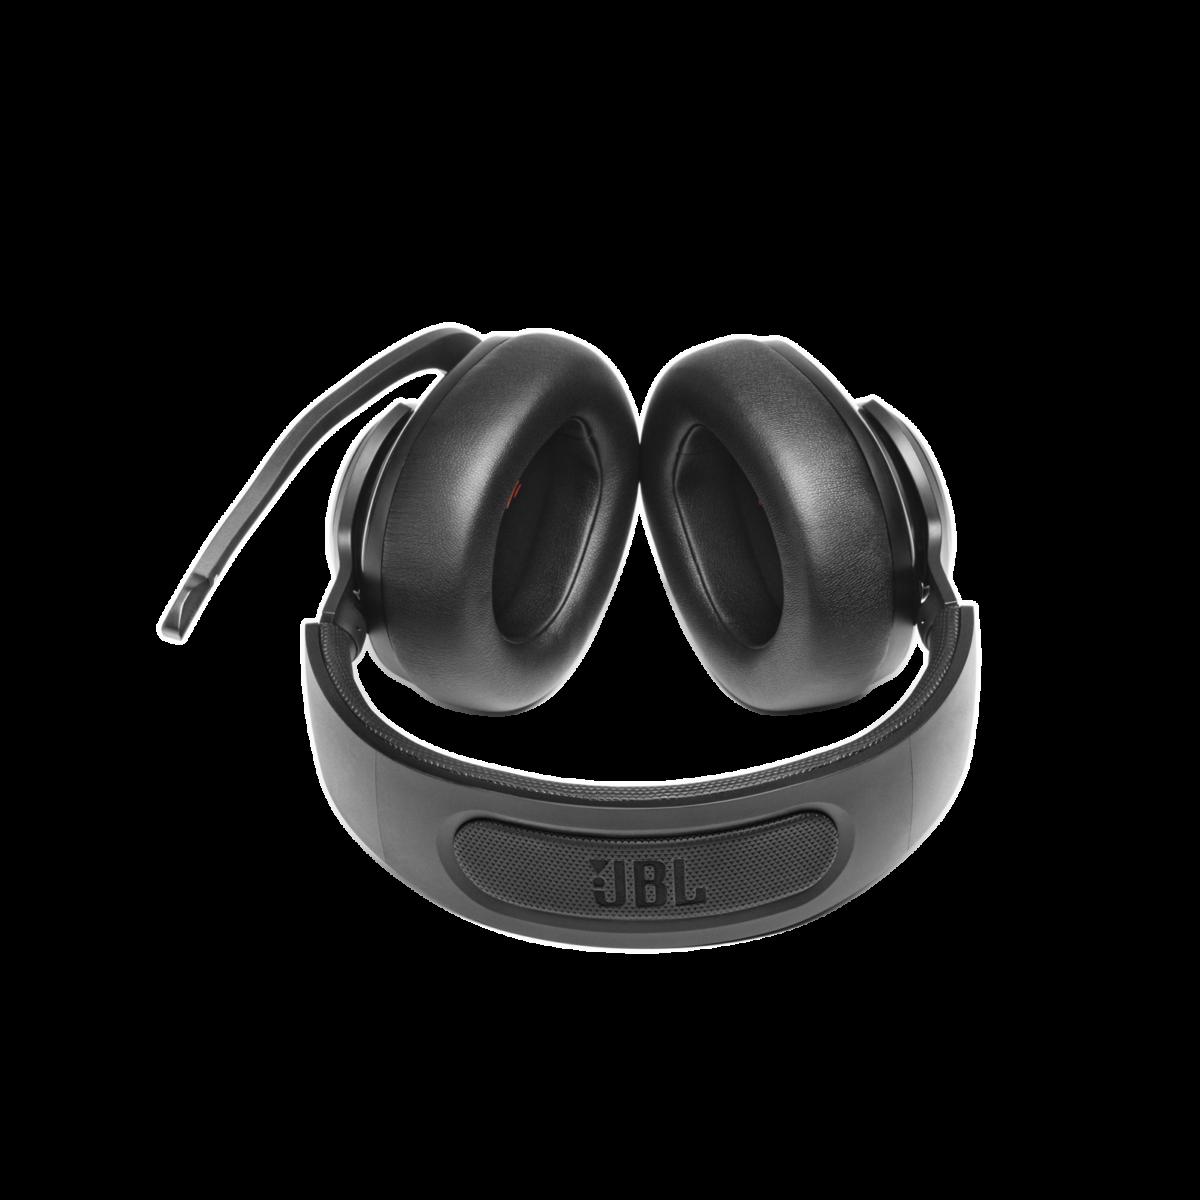 JBL Quantum 400 Product Image Headband